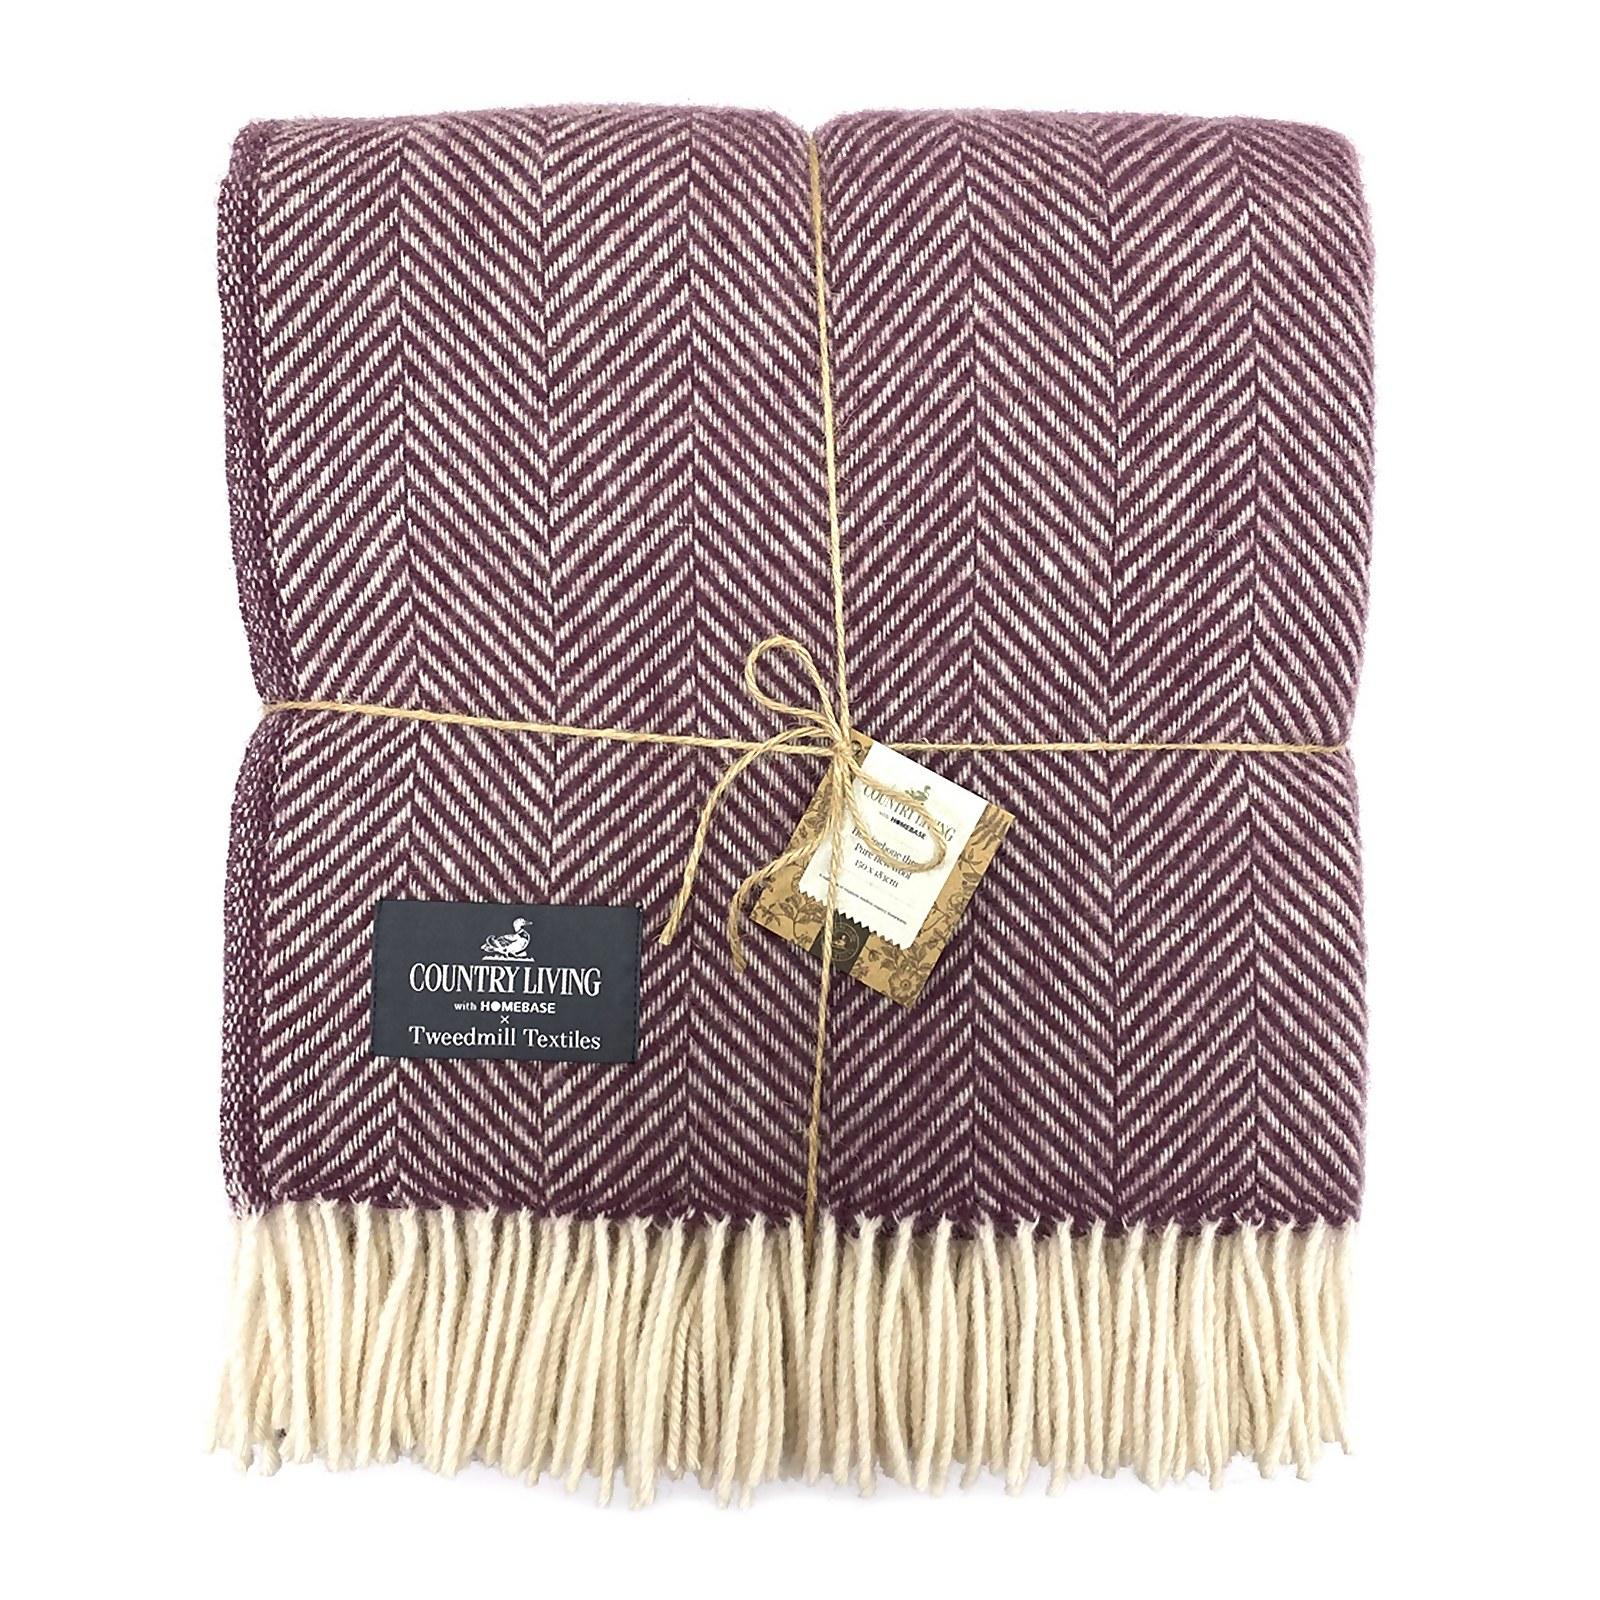 Country Living Wool Herringbone Throw - 150x183cm - Grape